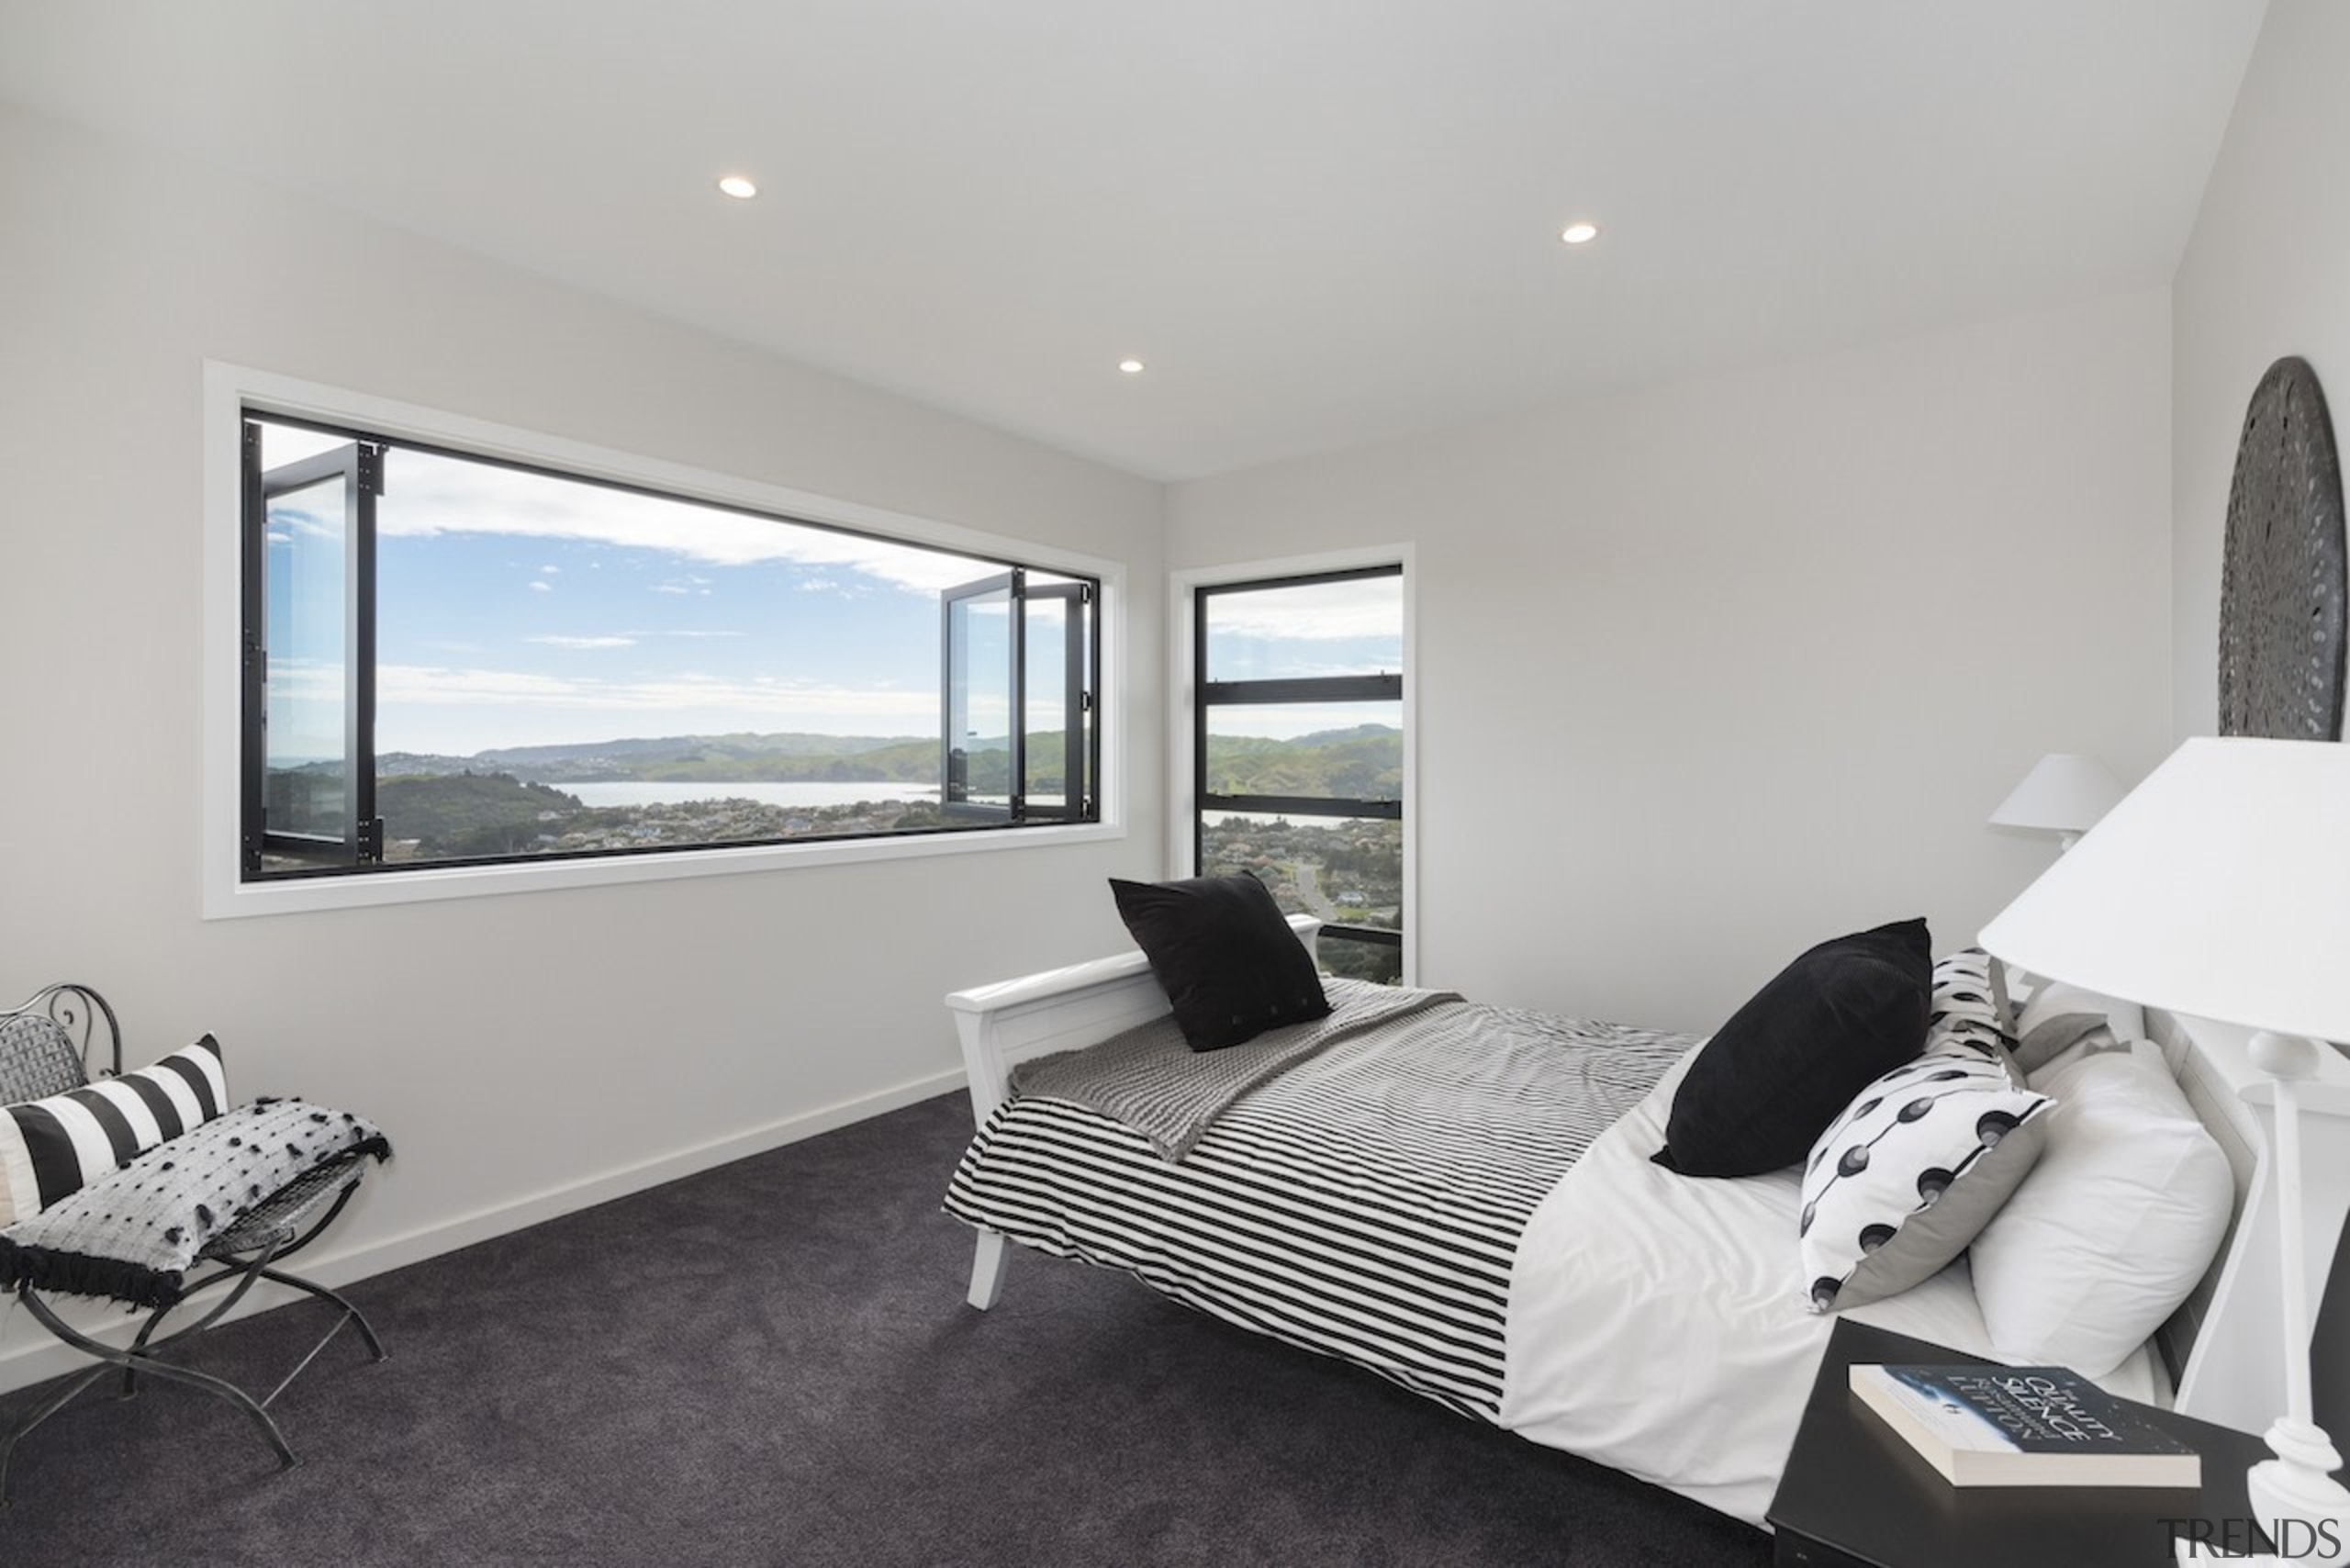 Landmark Homes  Fitzroy Design Master Bedroom - architecture, bedroom, floor, house, interior design, property, real estate, room, window, gray